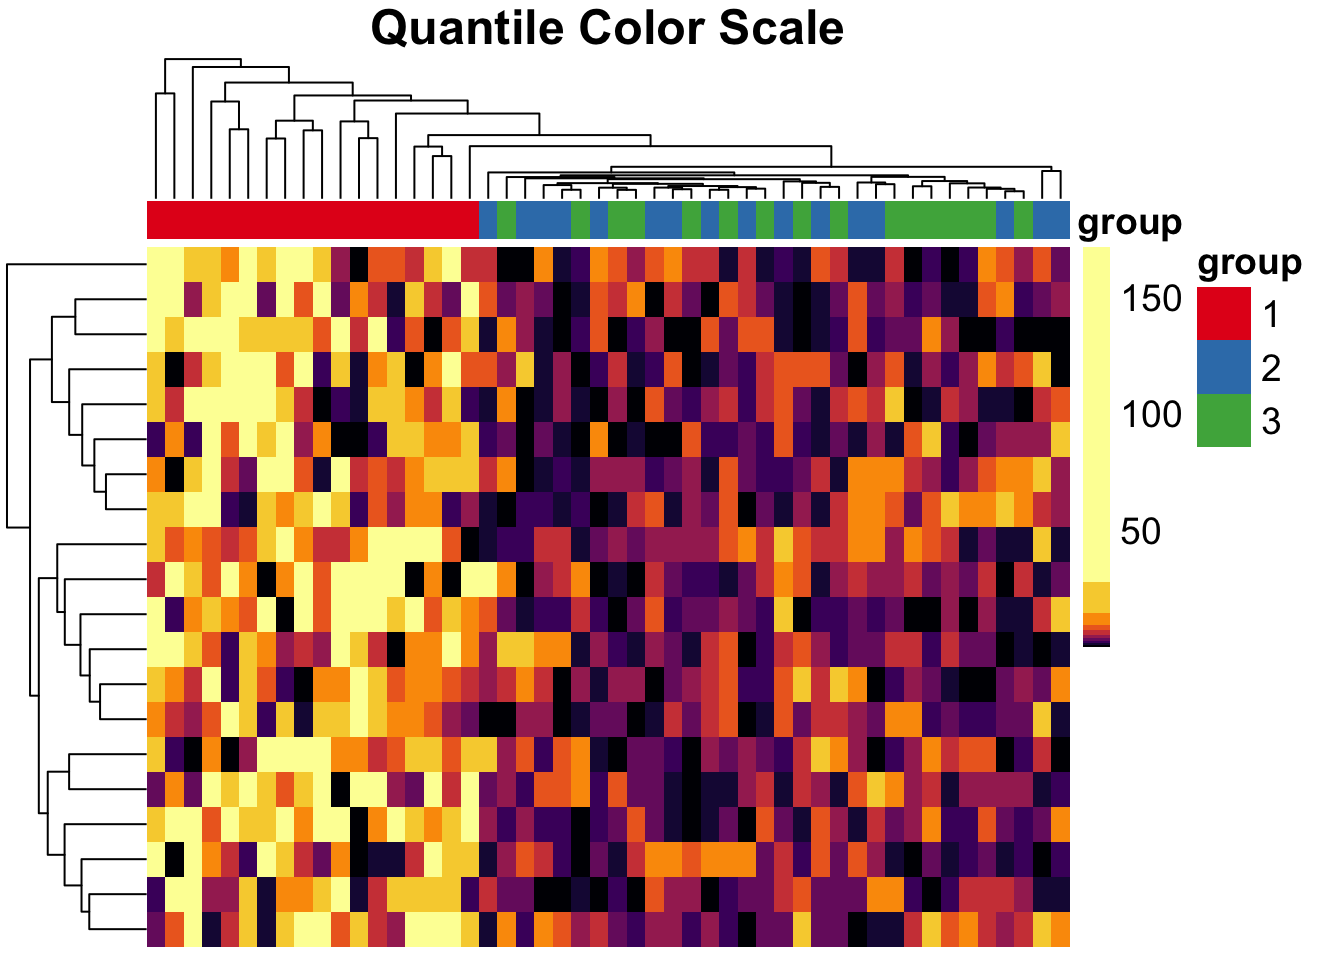 plot of chunk pheatmap-quantile-example